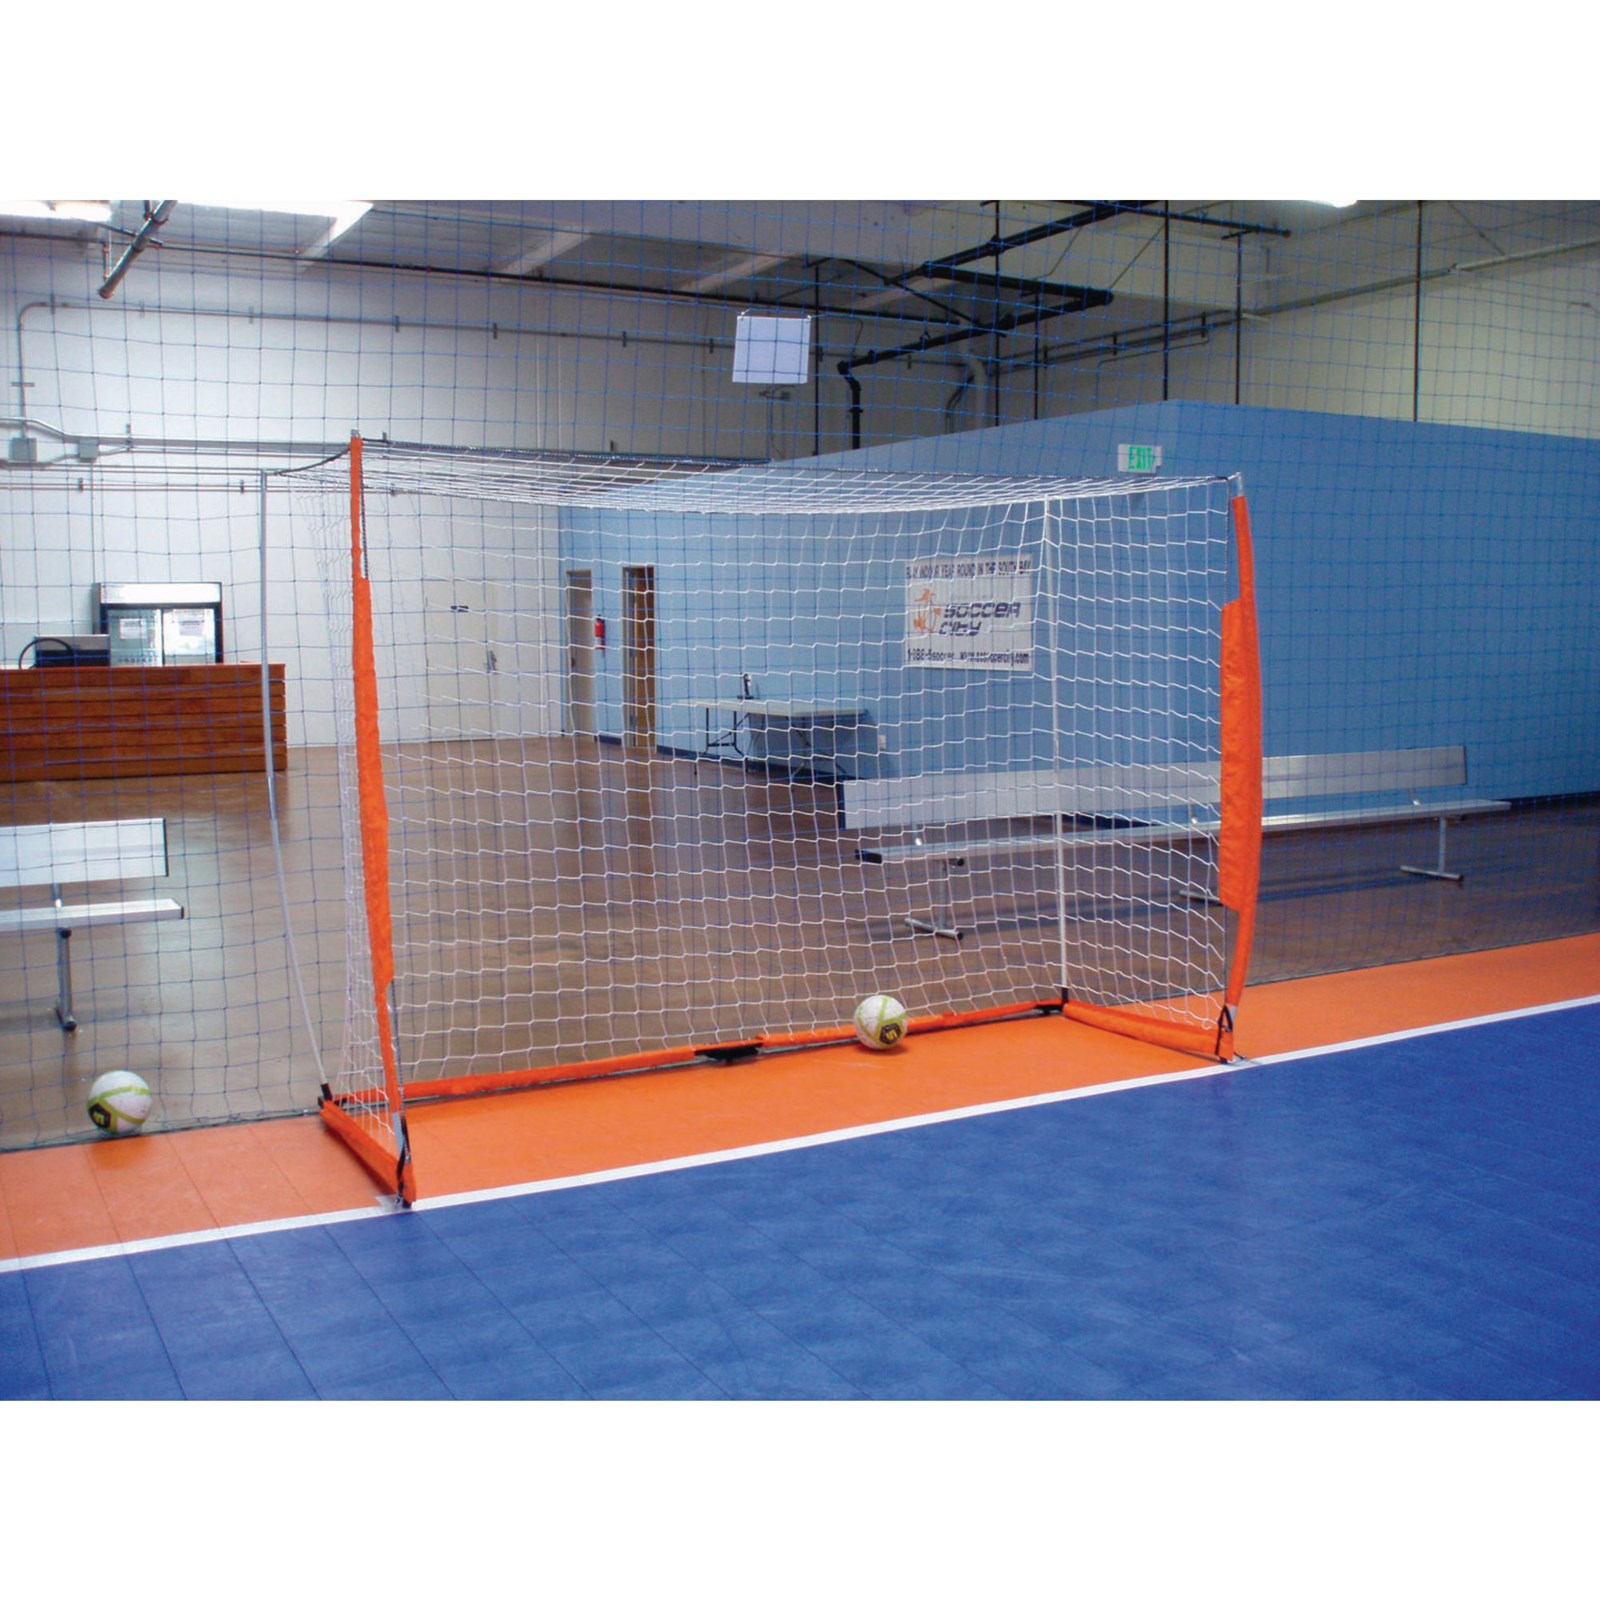 Bownet Futsal Goal - 3m X 2m